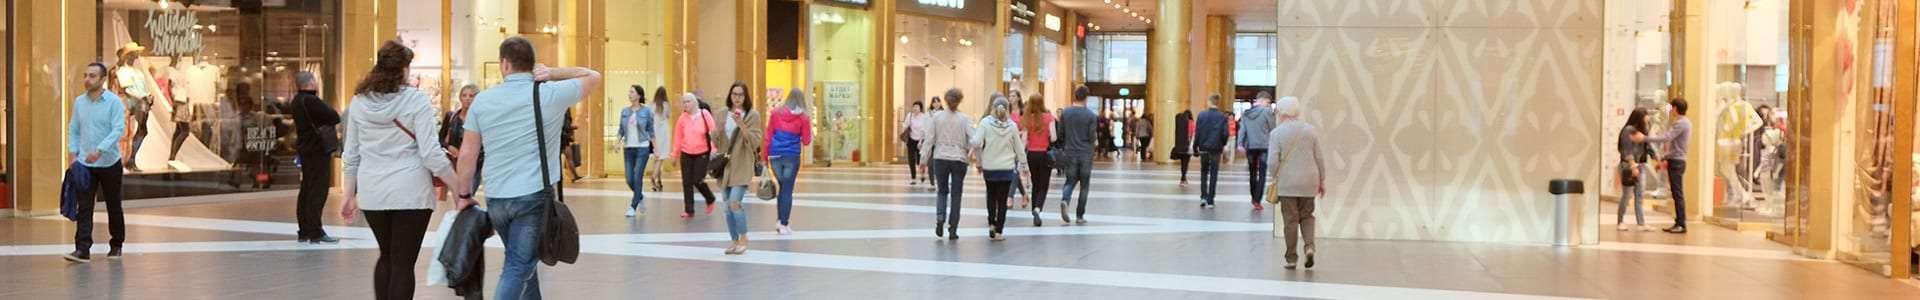 Shopping-Centre-Bottom